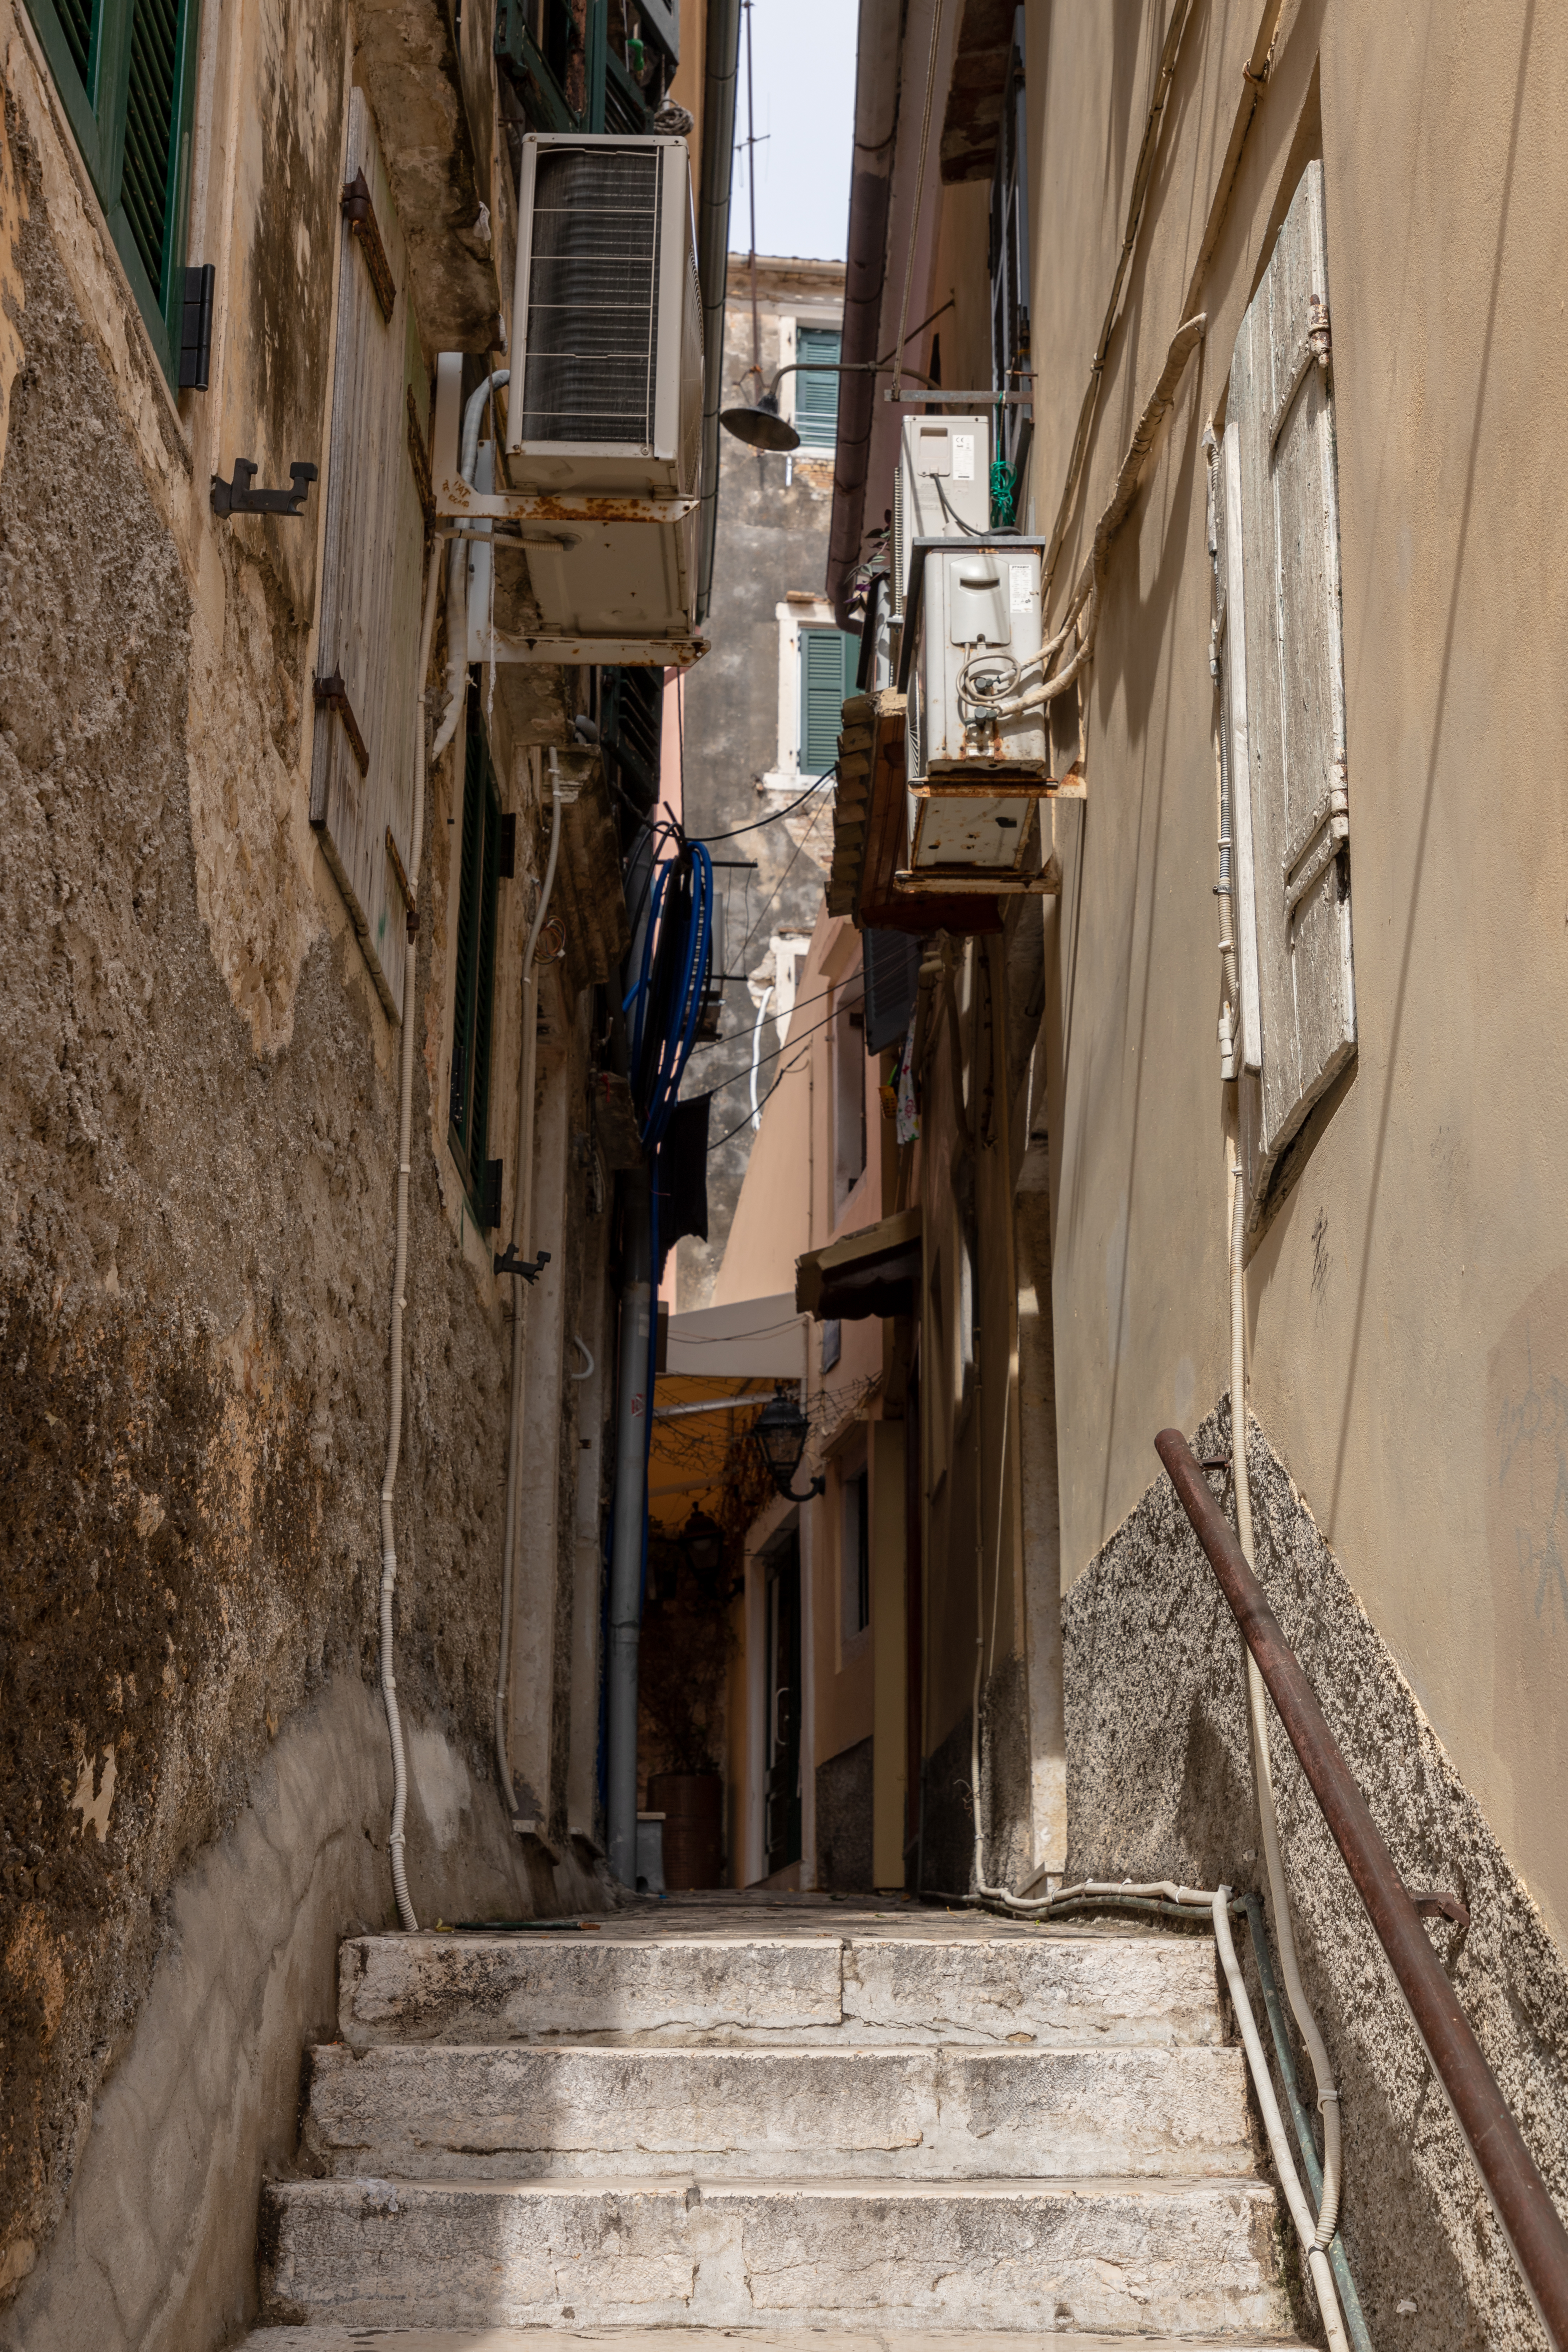 Old town, Corfu, Greece (2018) German Altstadt, Korfu, Griechenland (2018) object has role: photographer World Heritage Site ID: 978 refine date: 14:51